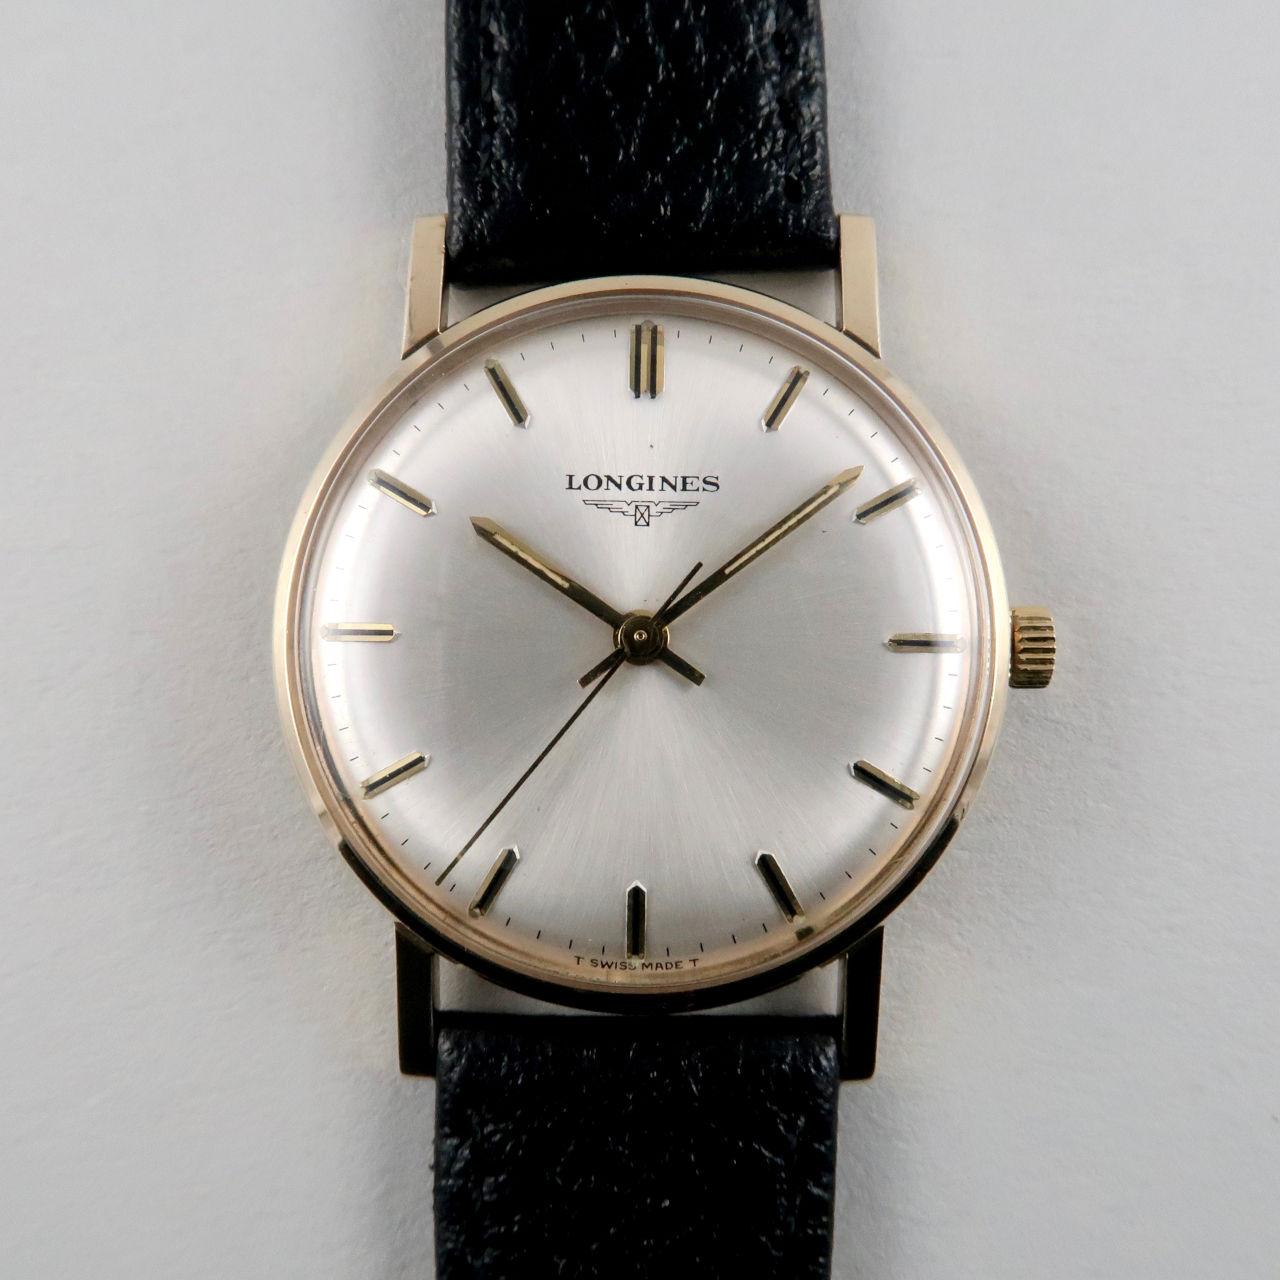 Longines Cal.284 gold vintage wristwatch, hallmarked 1970